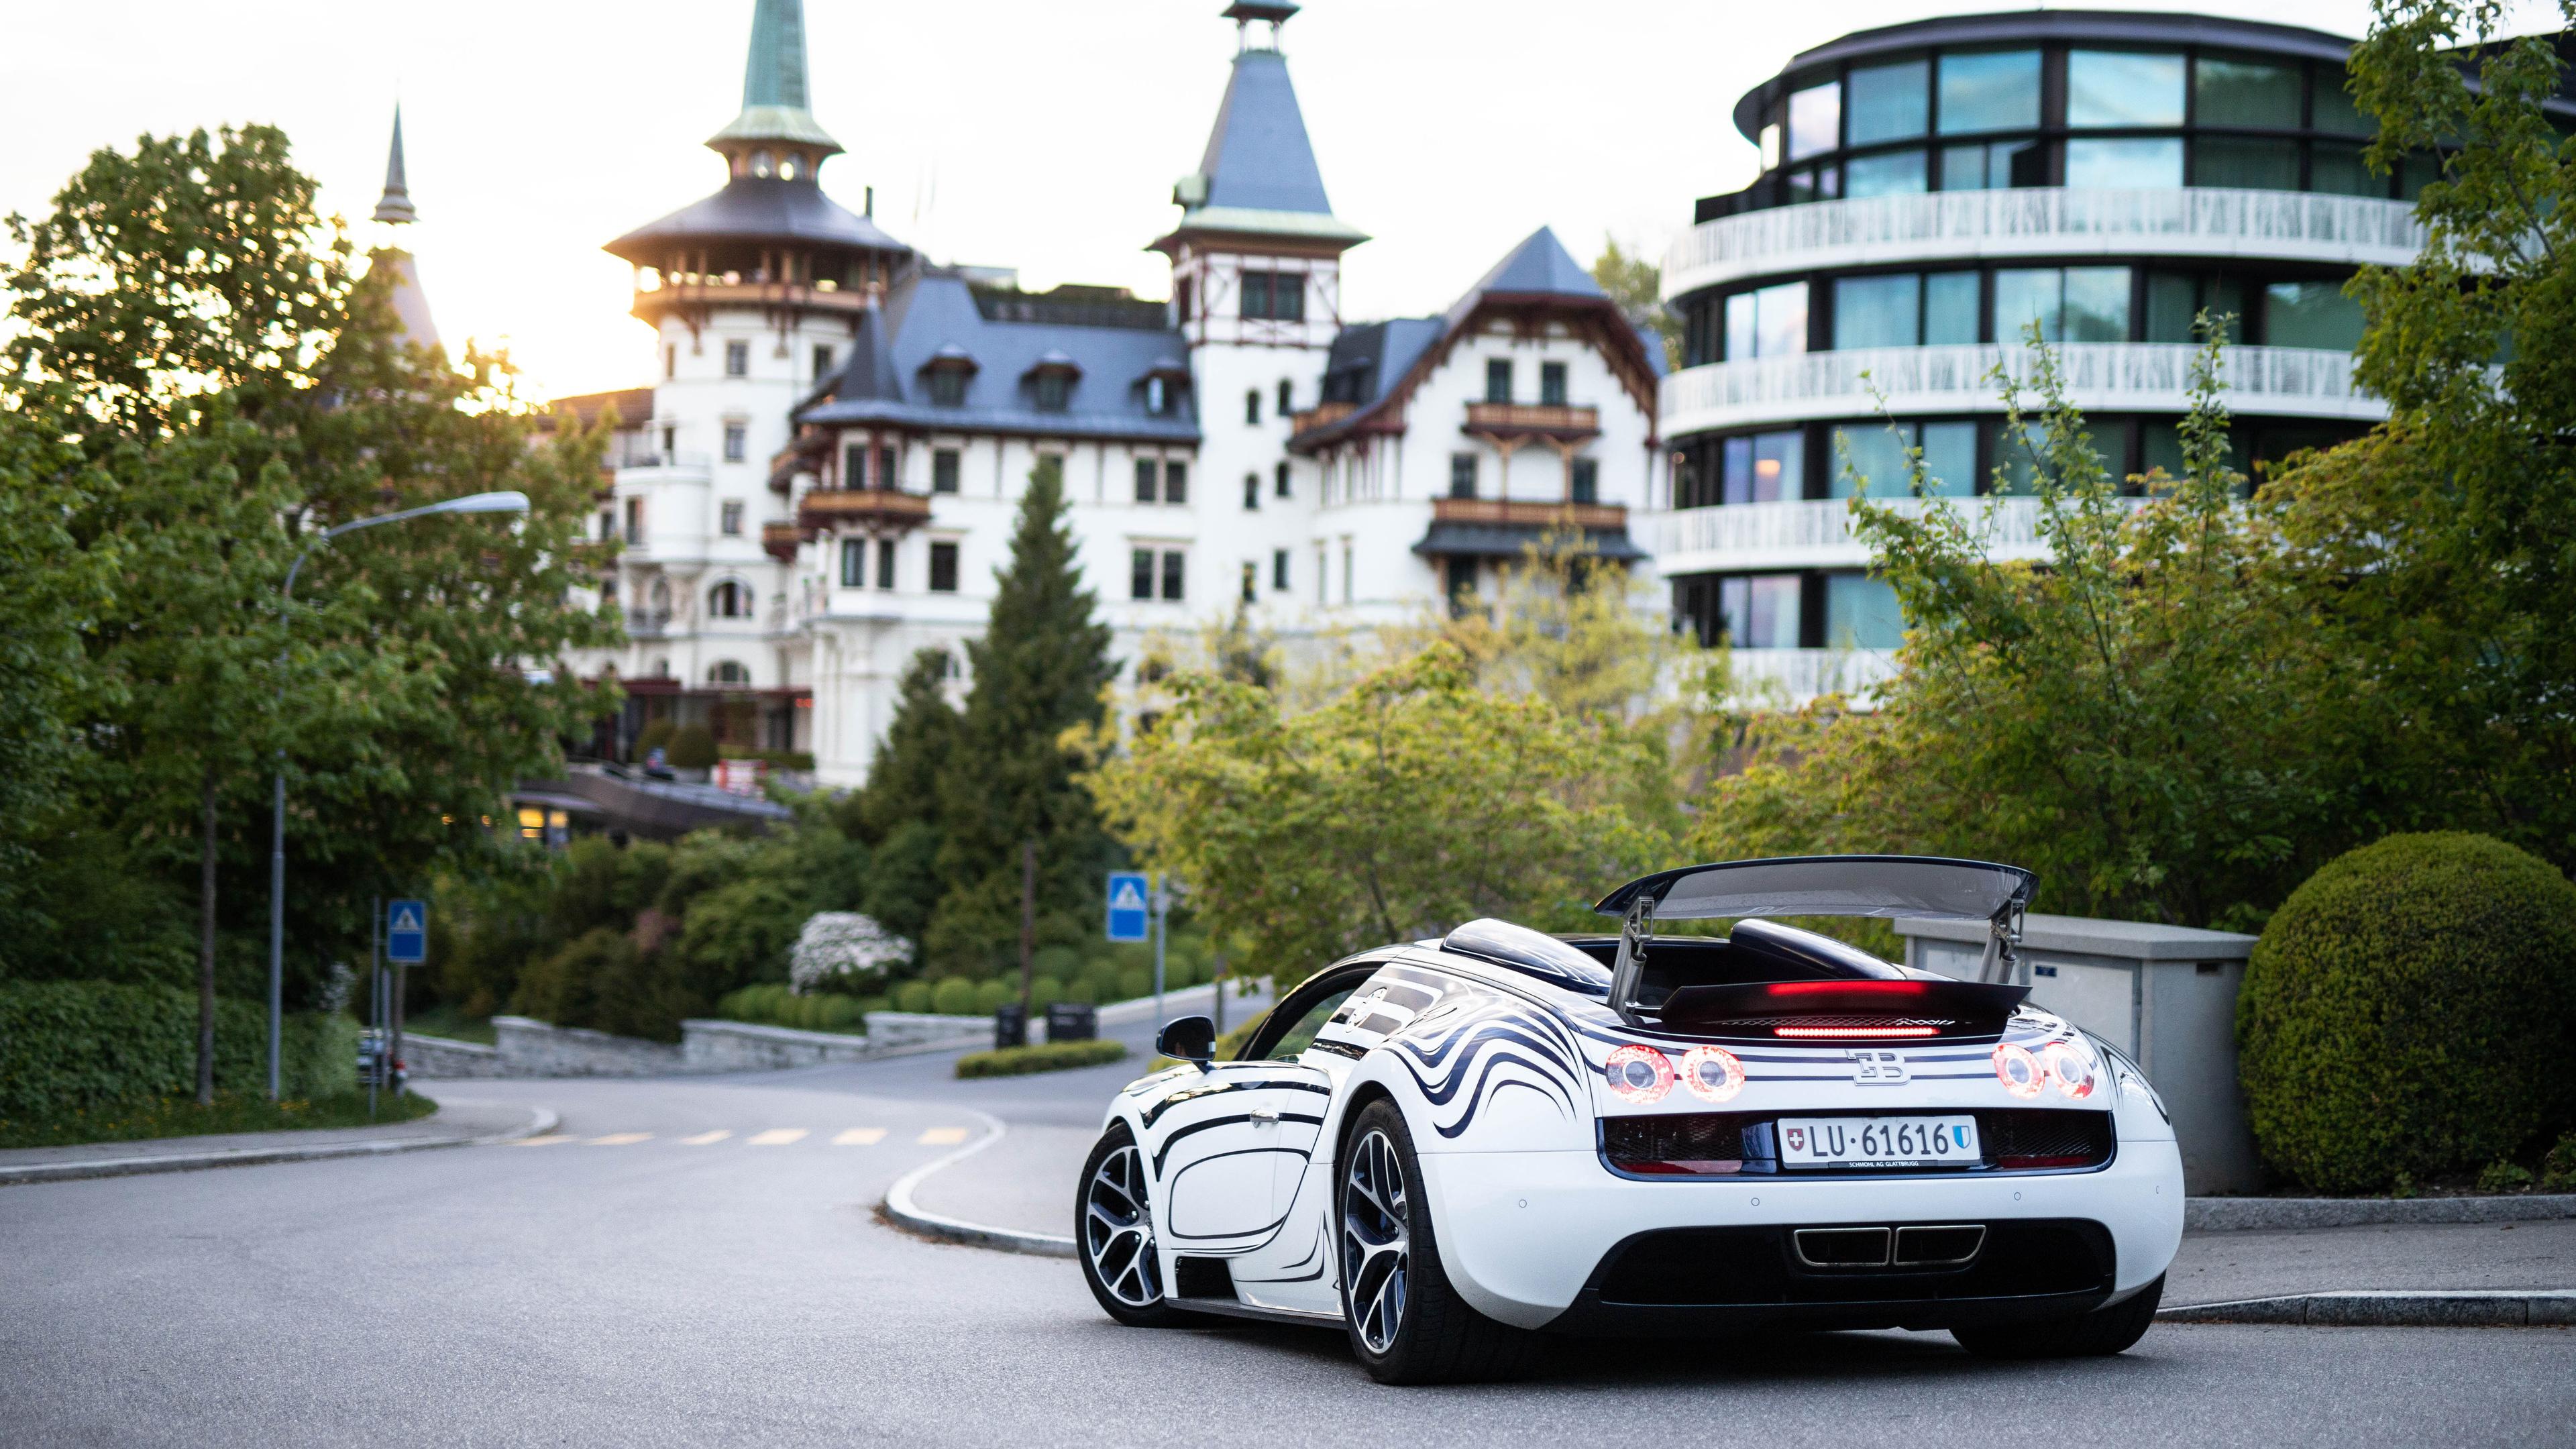 Wallpaper 4k Bugatti Veyron Grand Sport Roadster Rear 4k 4k